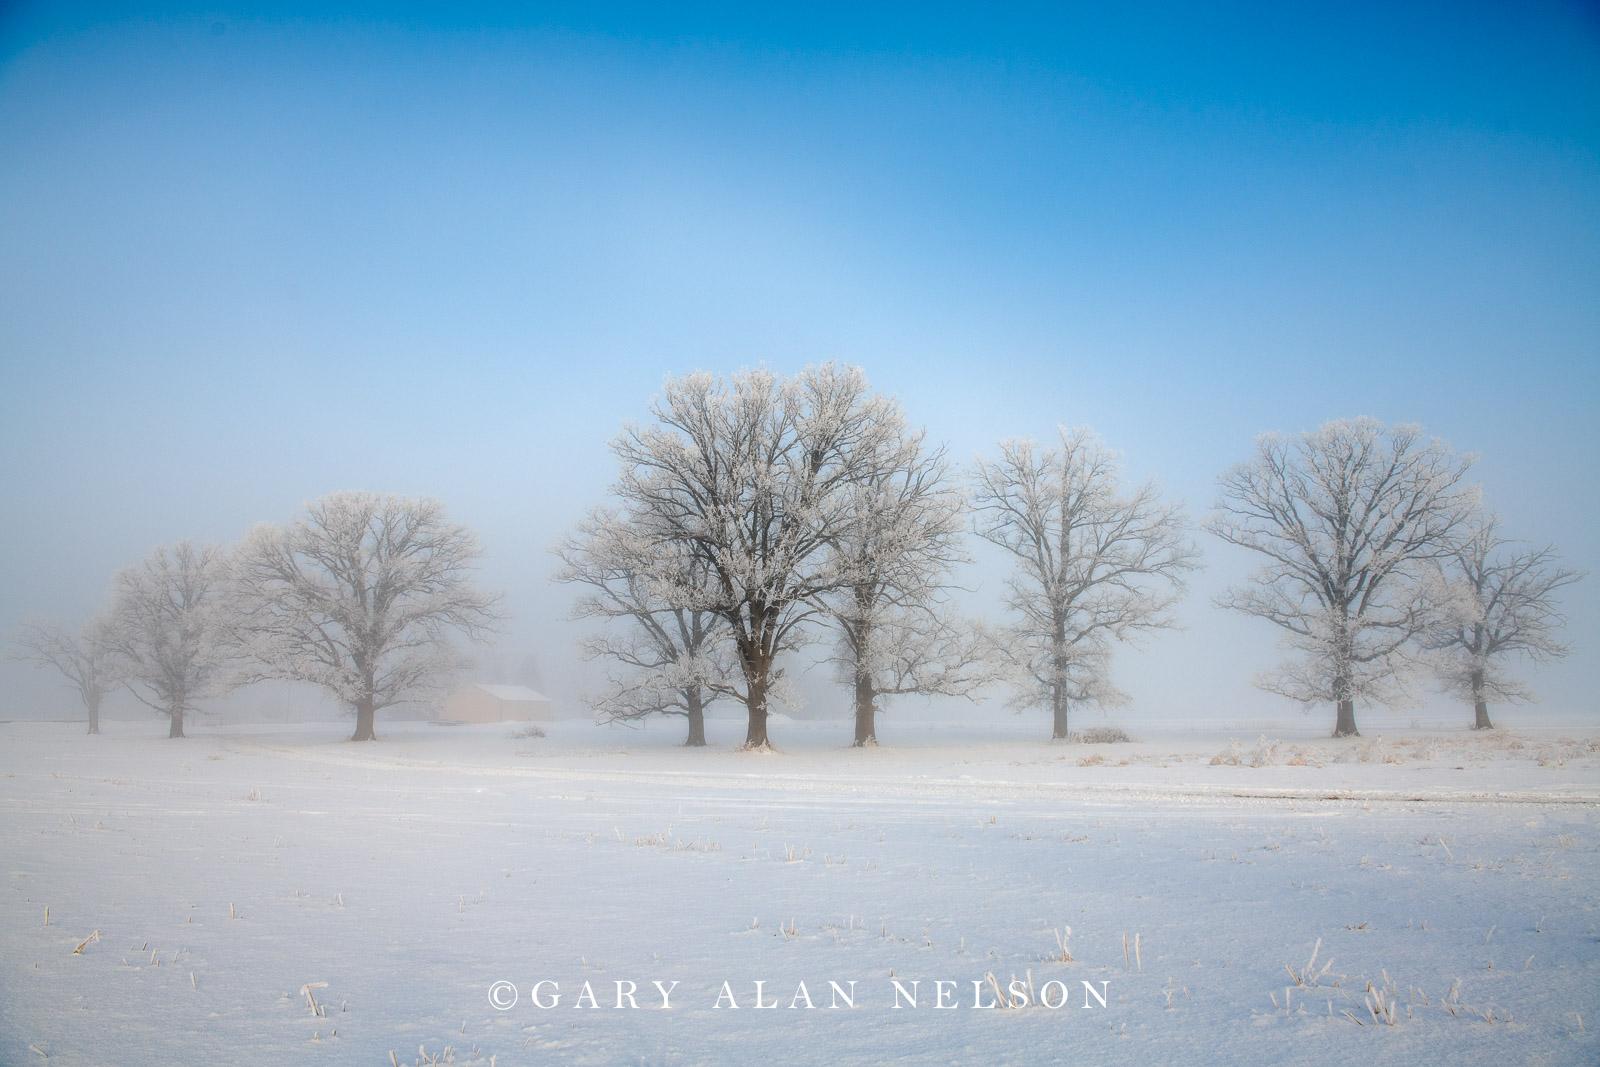 Rime ice on oak savannah, Chisago County, Minnesota